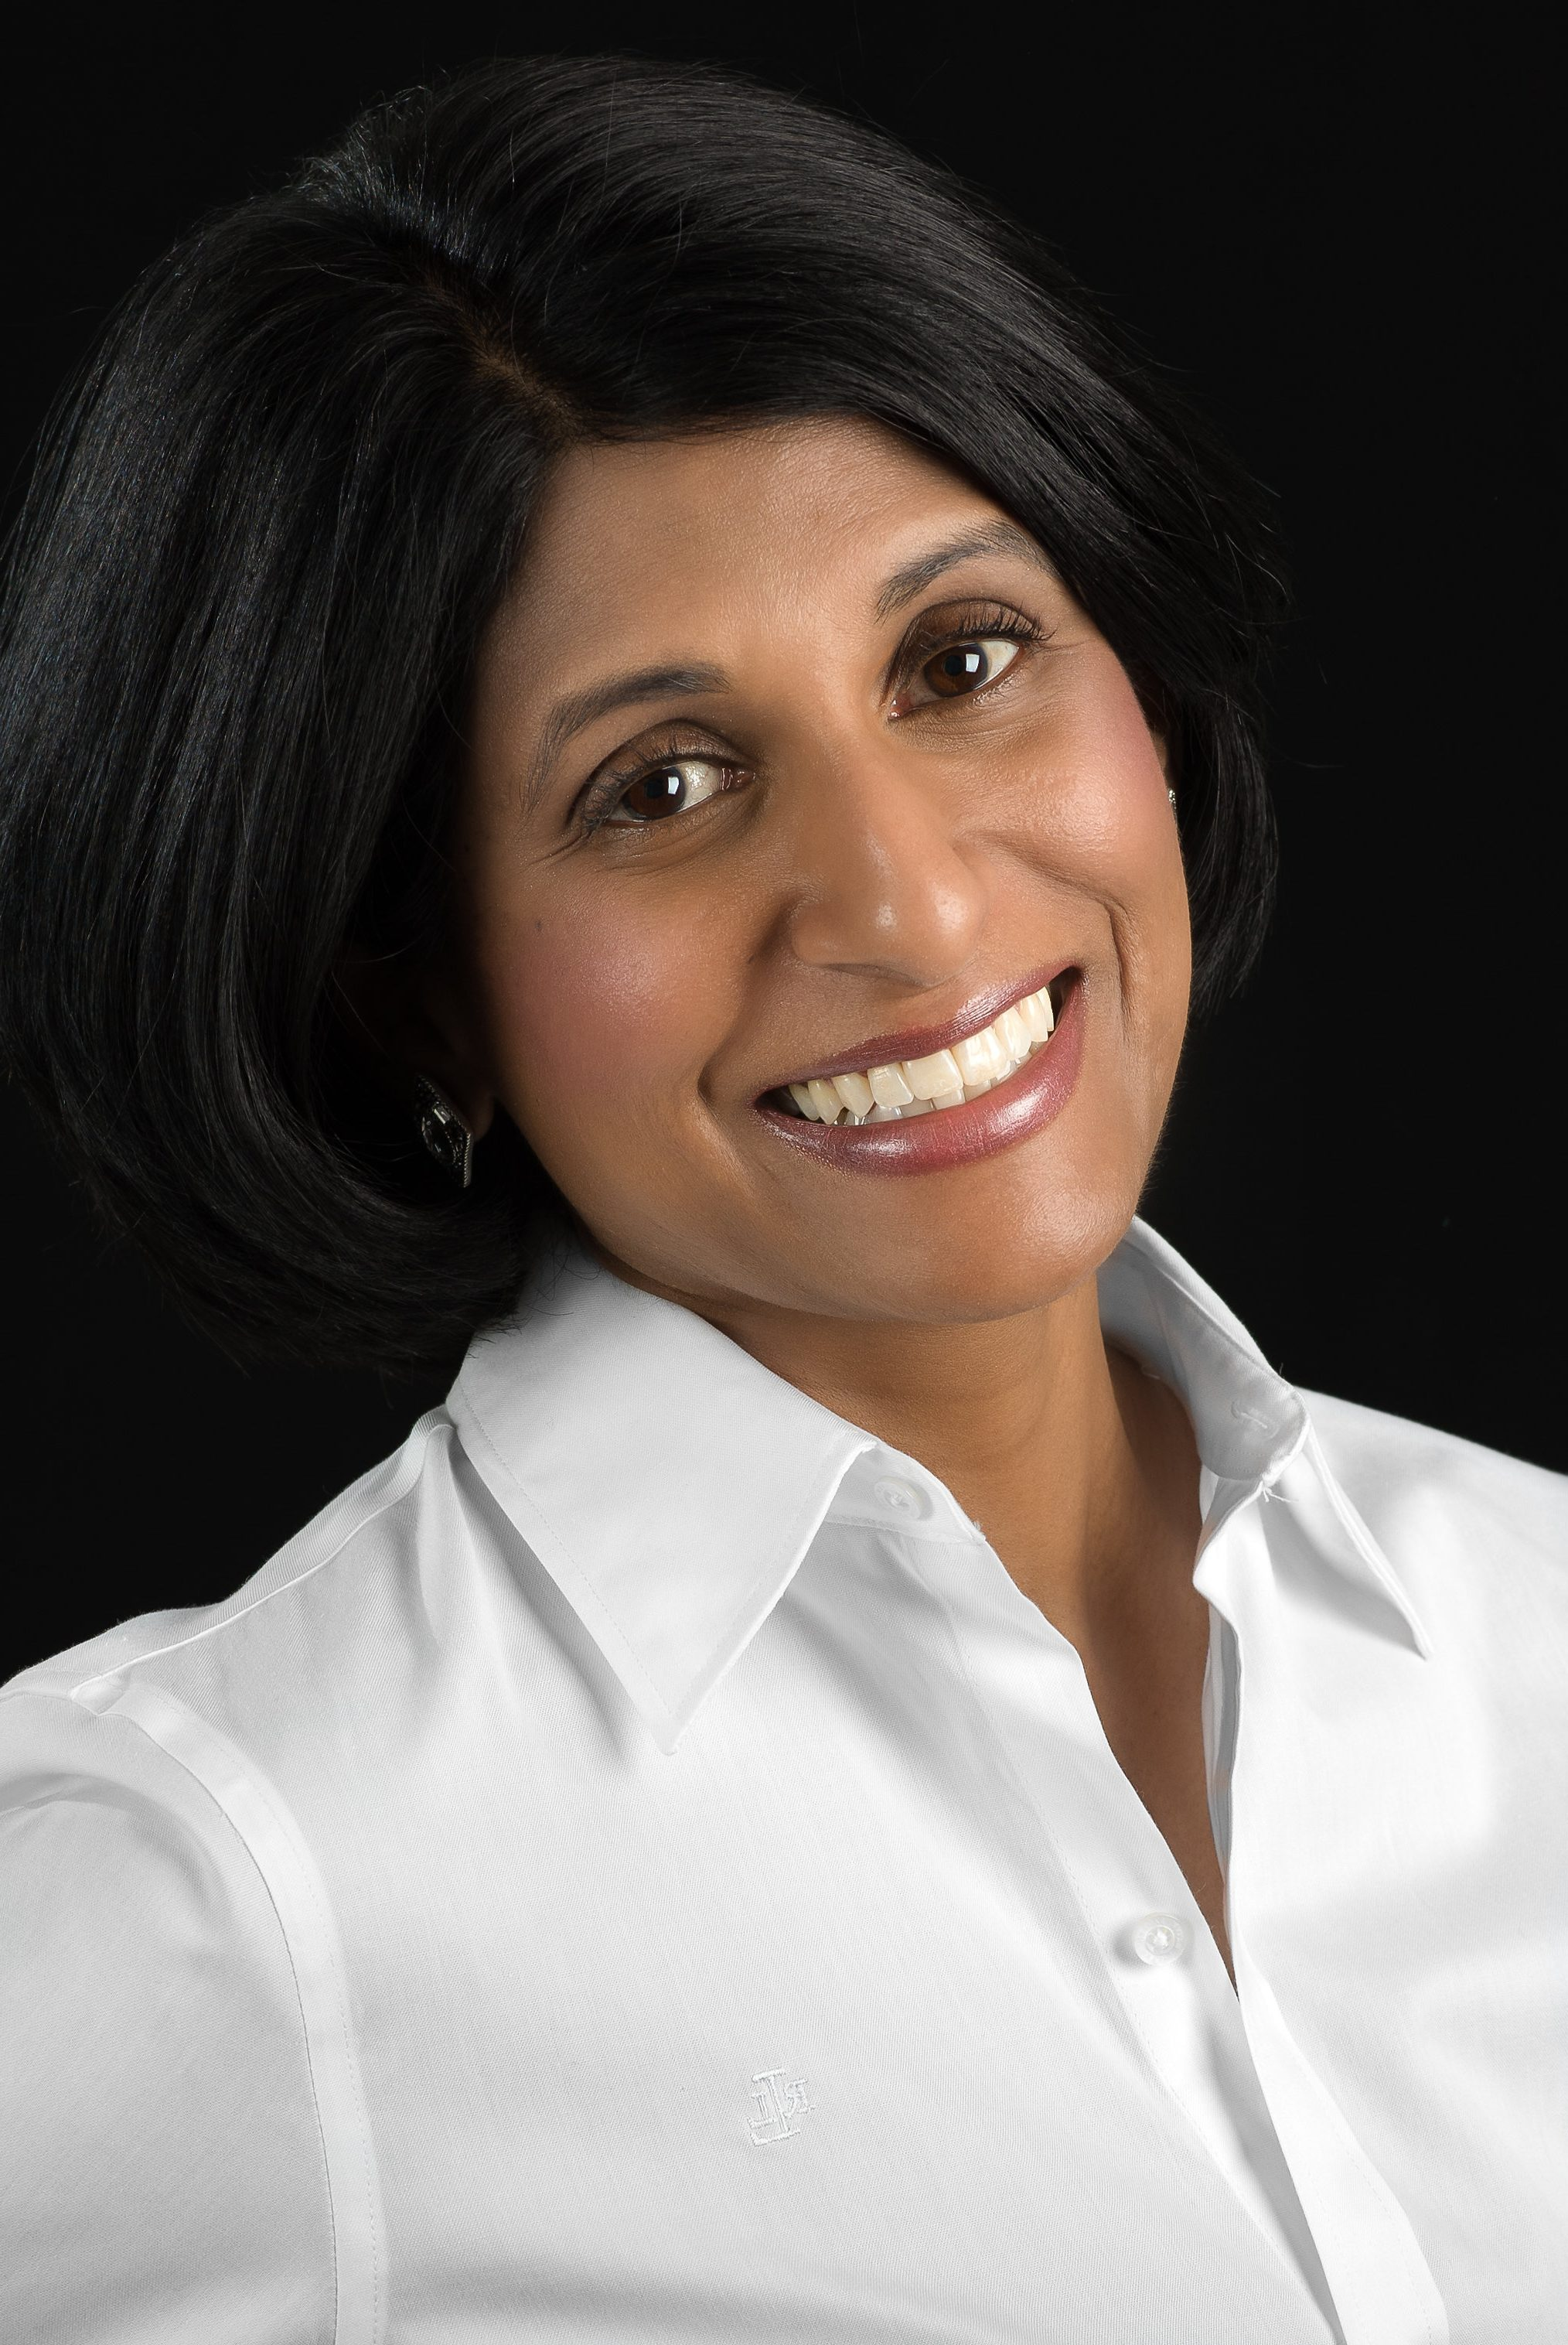 Picture of Dr. Manjari Kulkarni